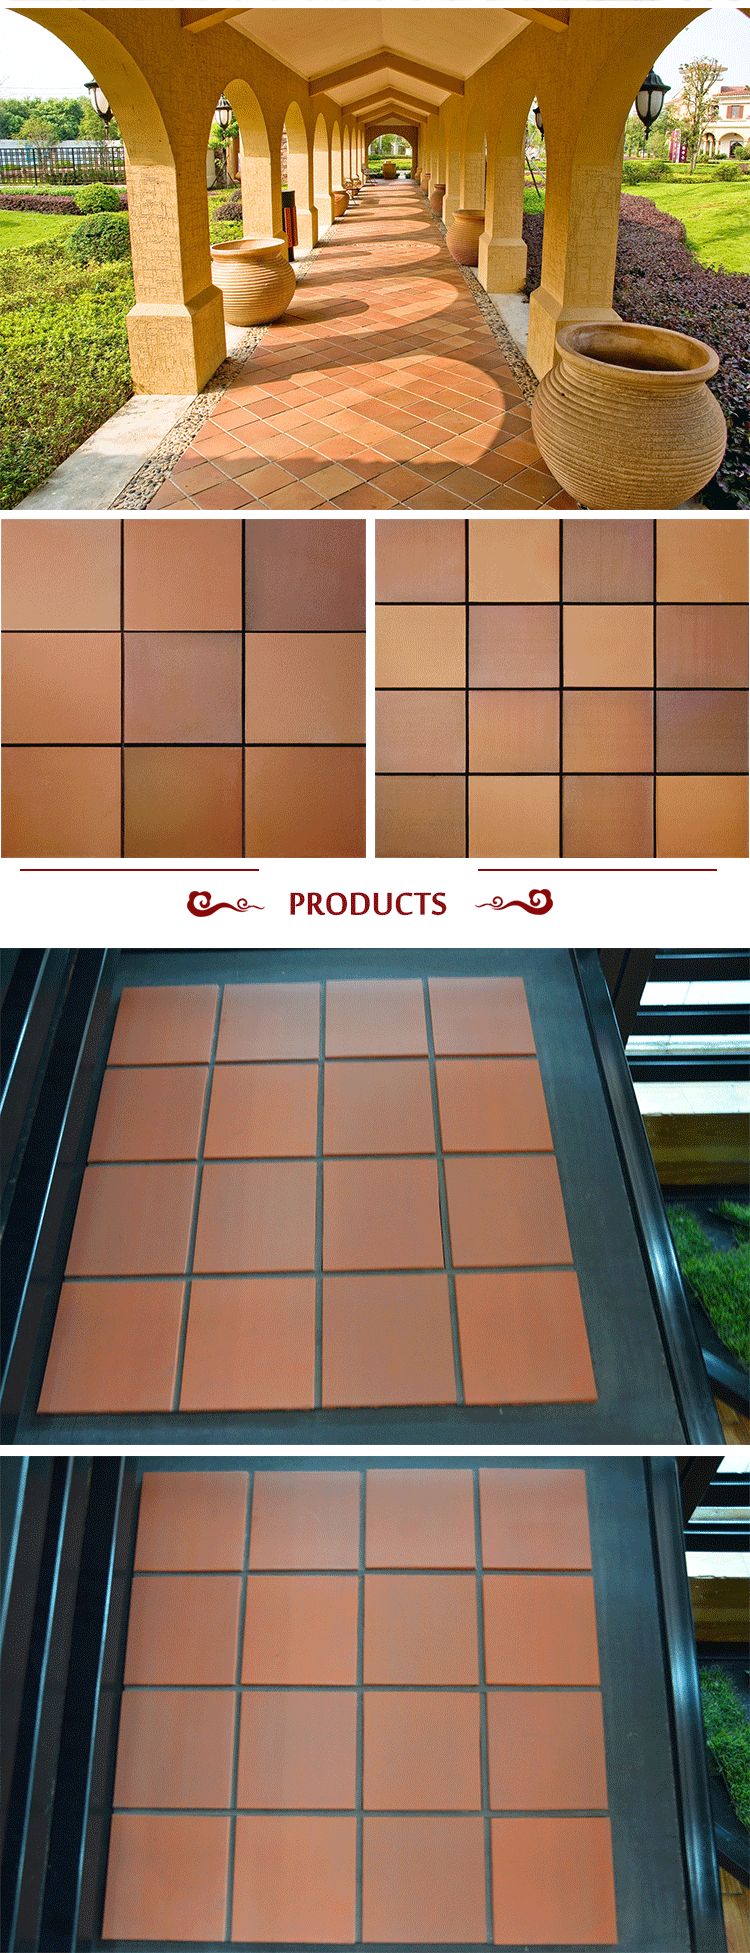 Mpb 004 supplier decorative outdoor terracotta floor tiles 150x150 buy terracotta tiles floor for Exterior terracotta floor tiles